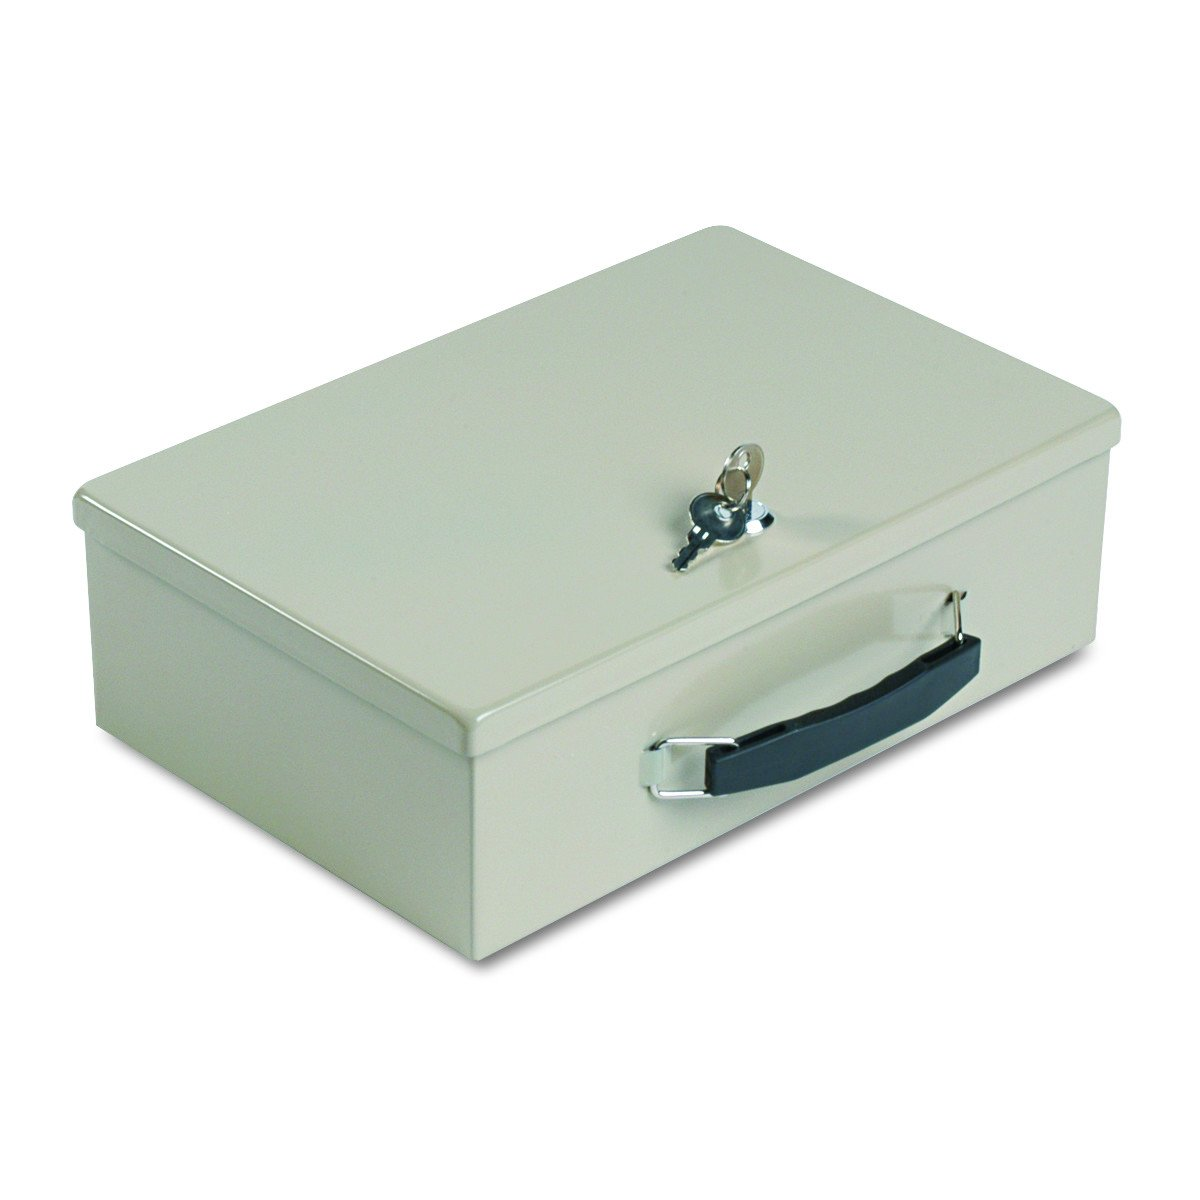 MMF Fire-Retardant Cash Box with Lock, 1 Each (MMF221614003)